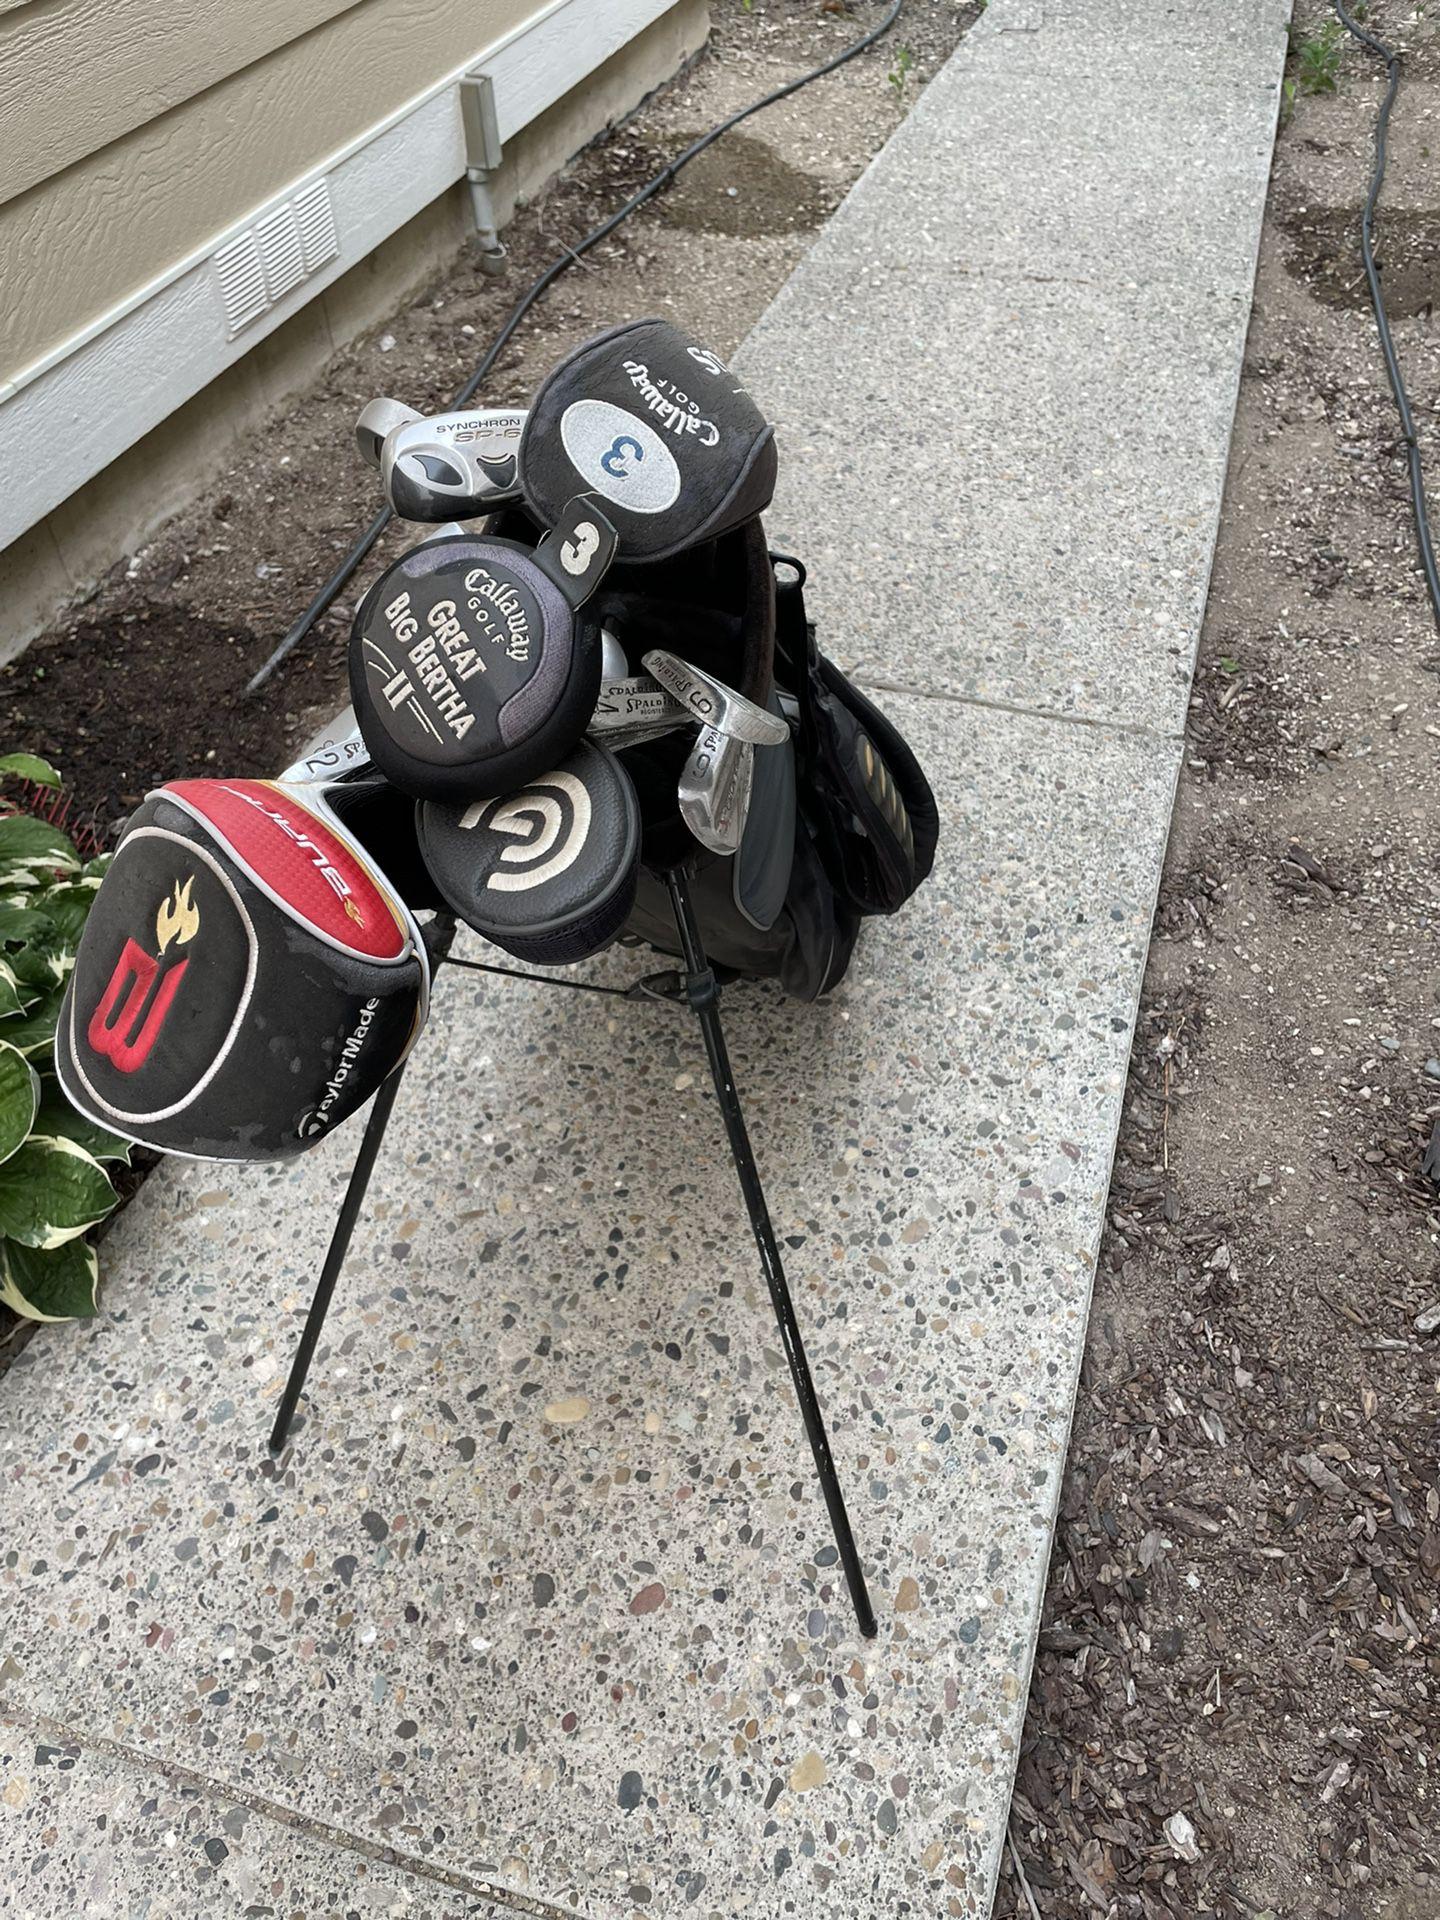 Golf Clubs, Bags, Bag Carrier